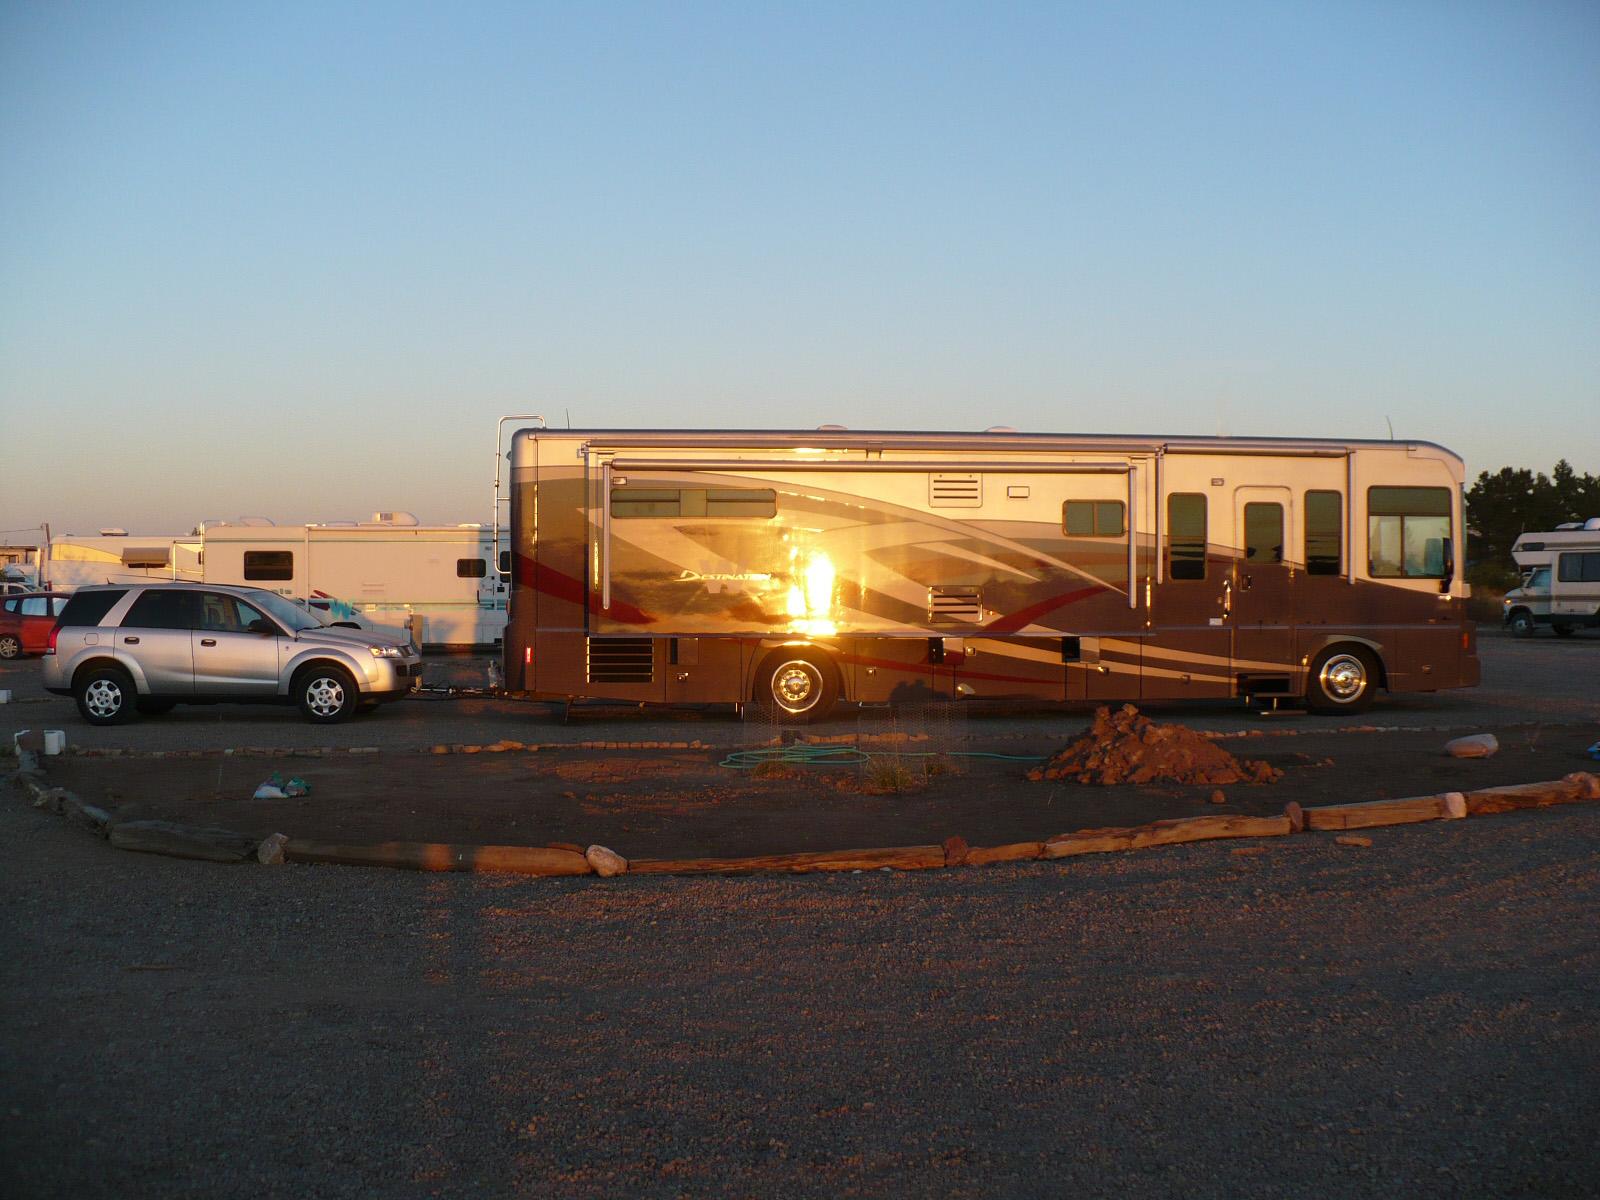 Click image for larger version  Name:Destination Sunset2.jpg Views:122 Size:513.9 KB ID:114035